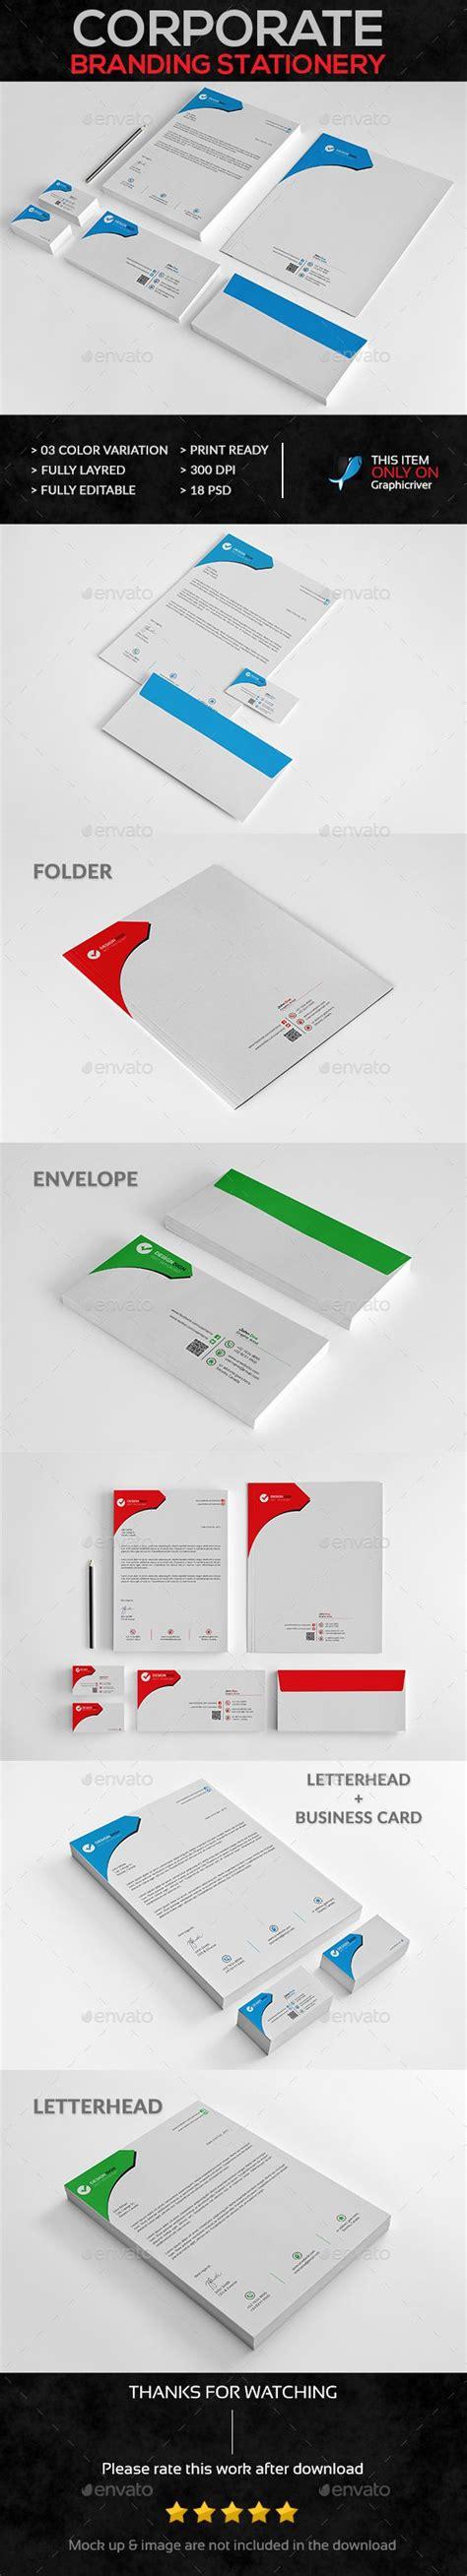 corporate identity  images corporate identity